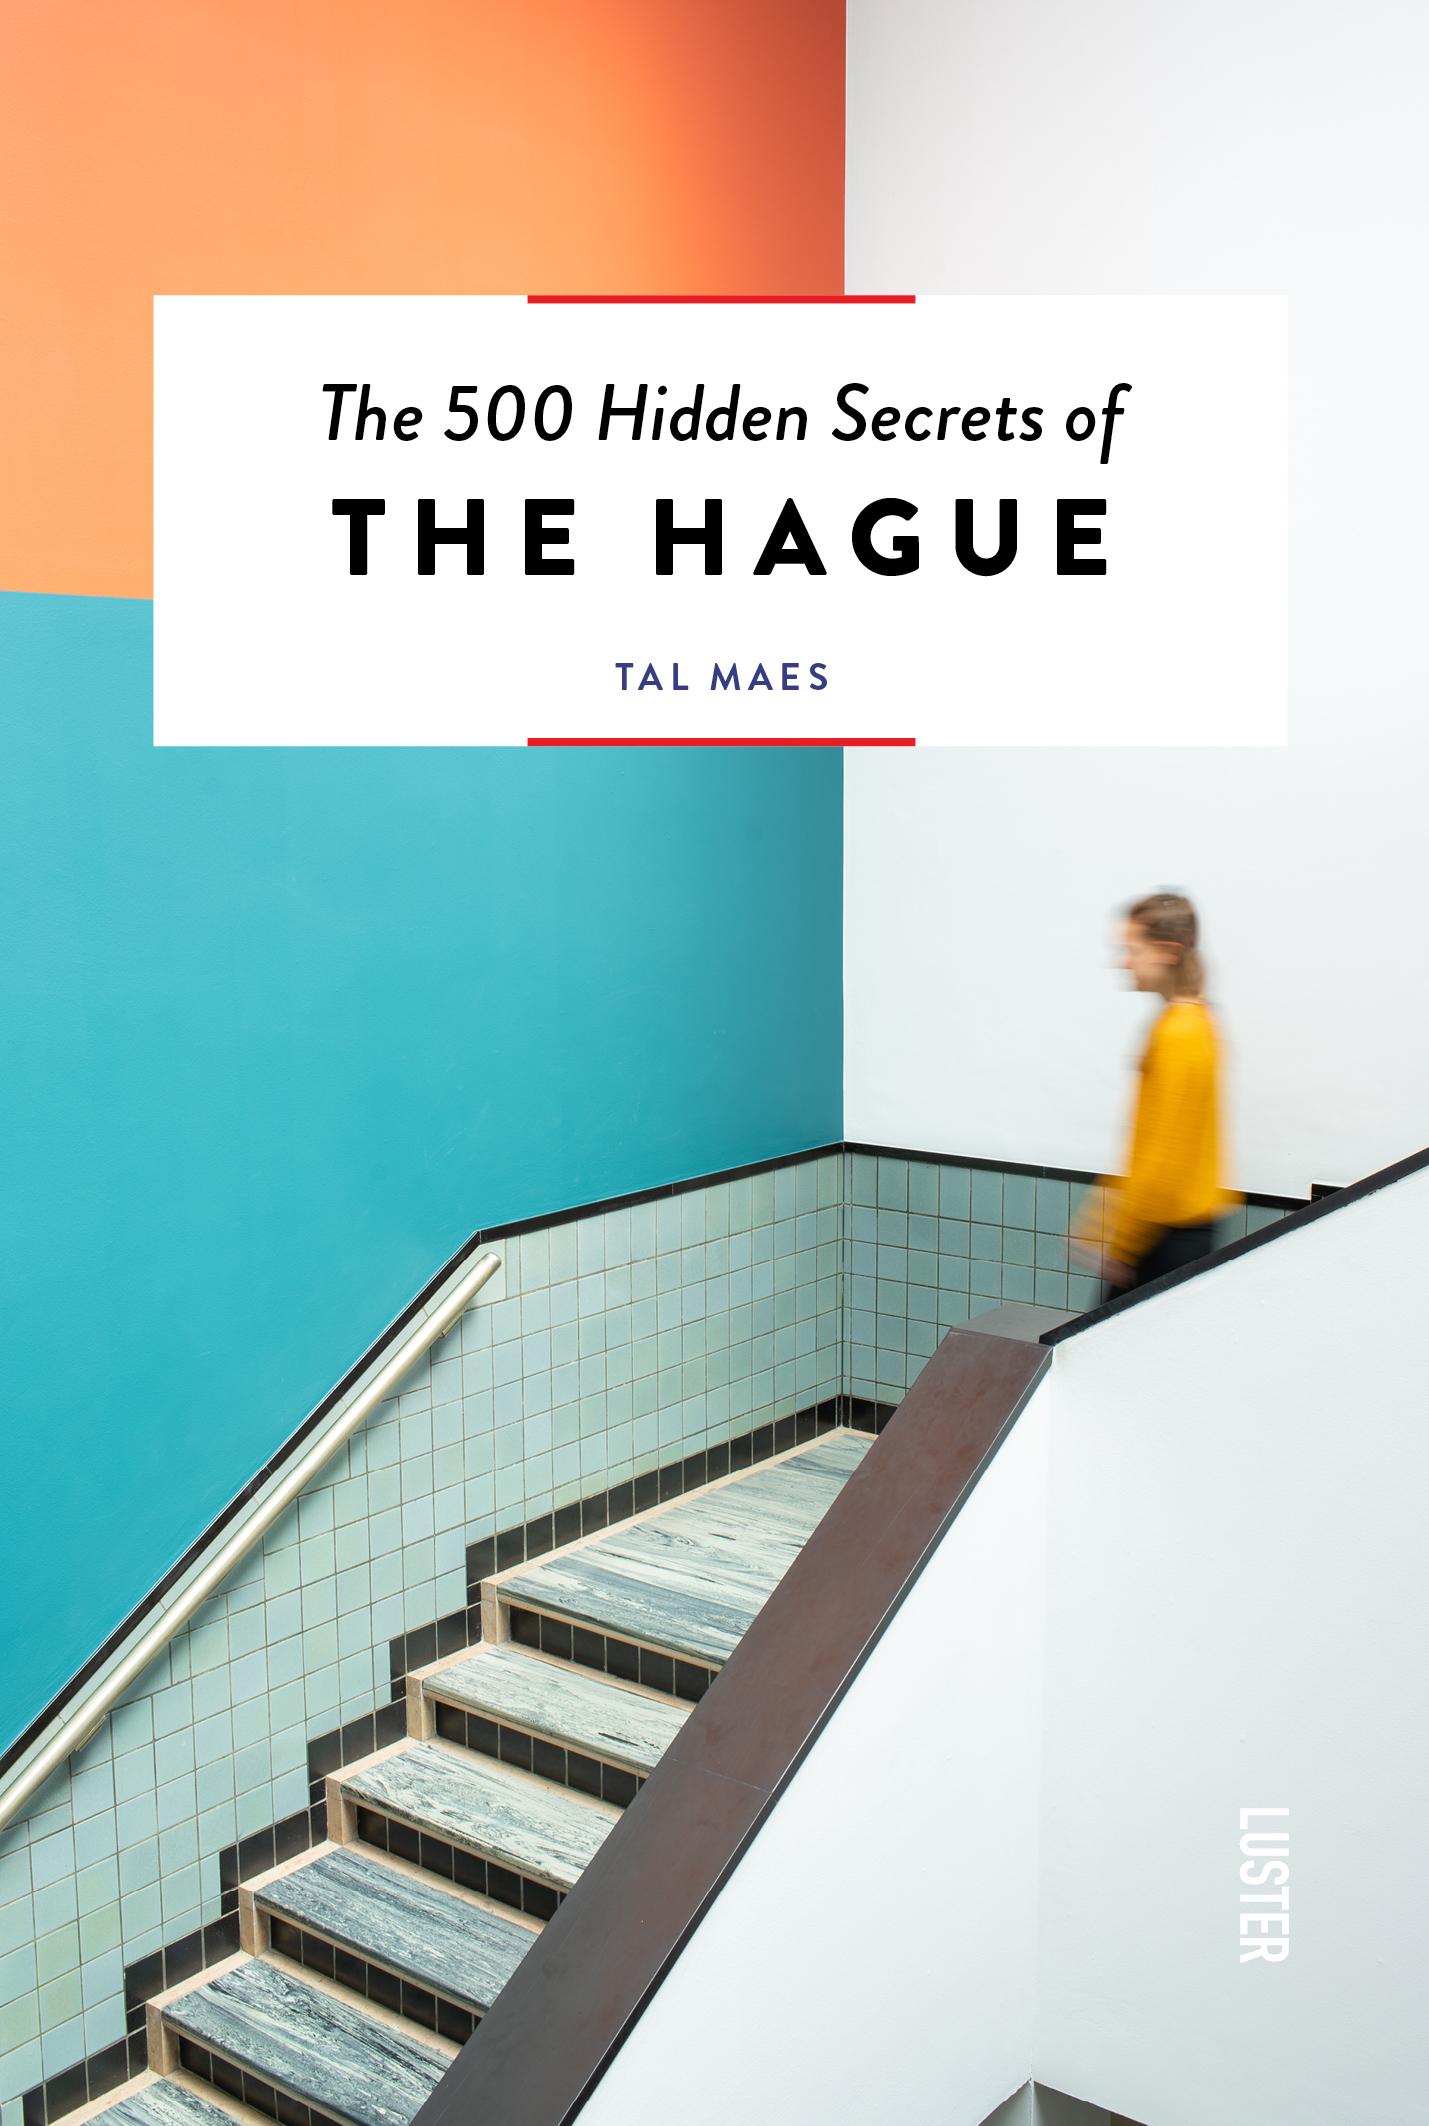 500HS_THEHAGUE_01_SEP2019_COVER_brochure